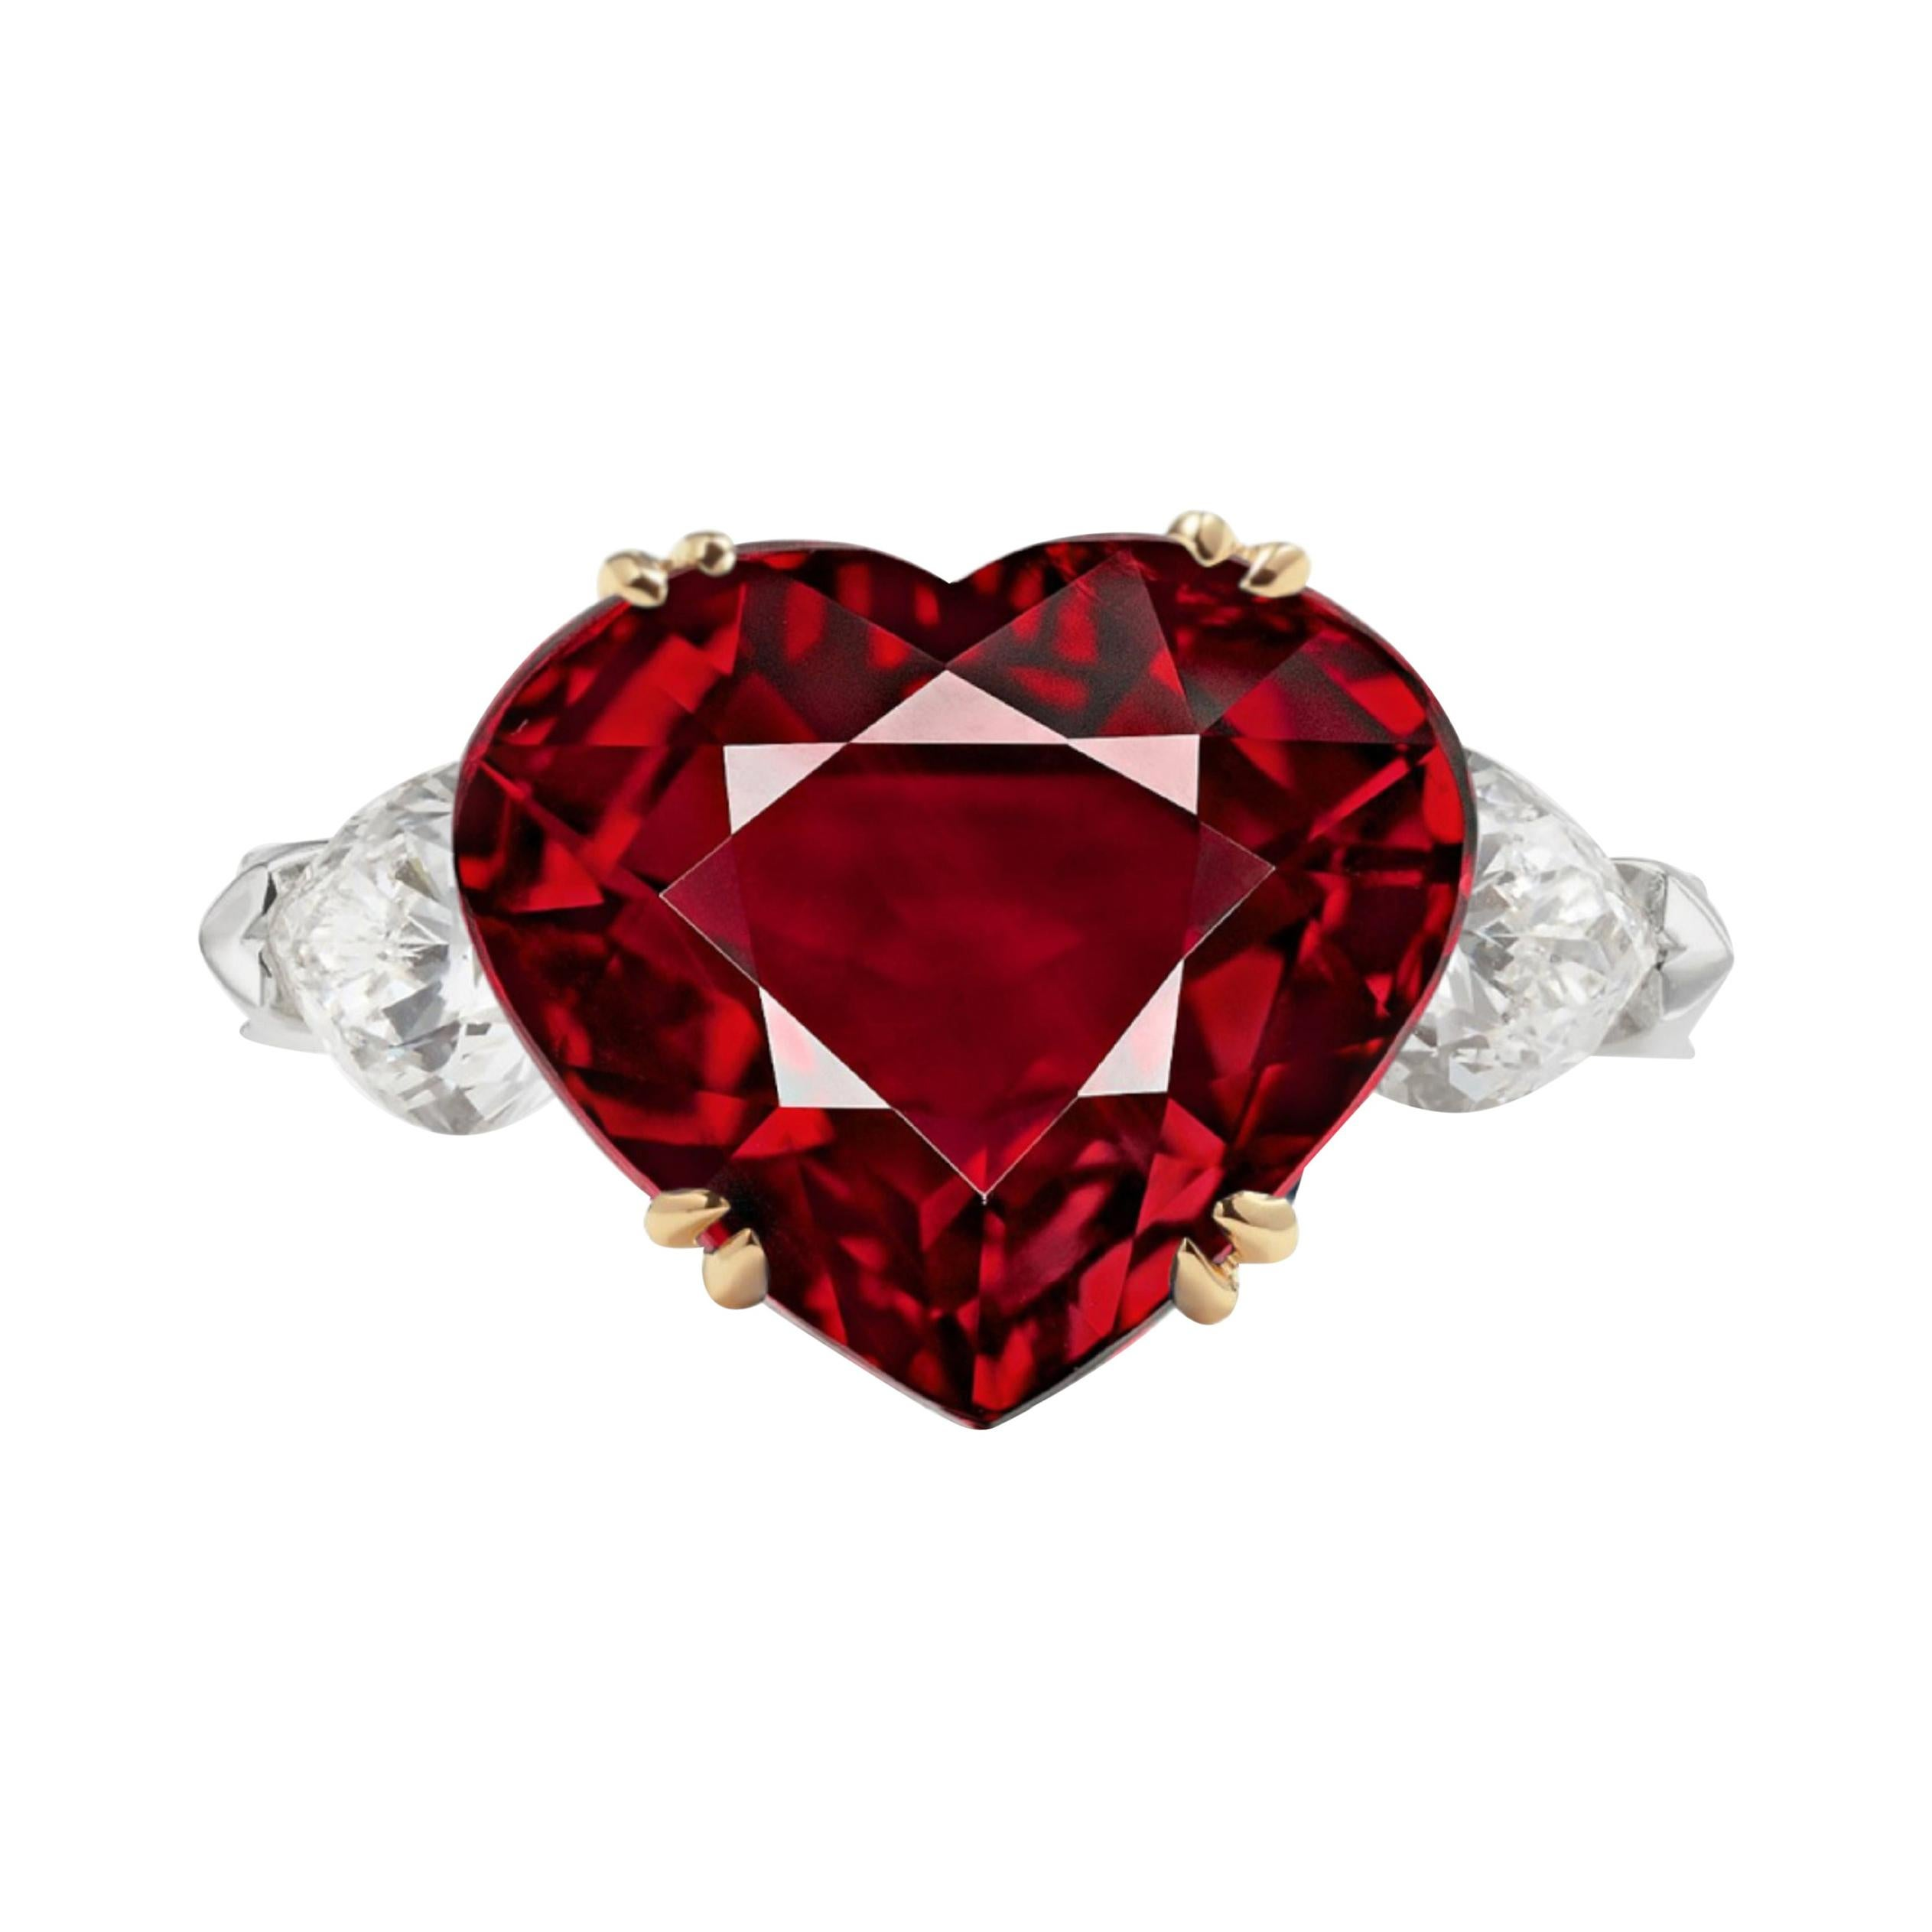 FLAWLESS GRS Switzerland 5.80 Carat Heart-Cut Pigeon Blood Ruby Diamond Ring